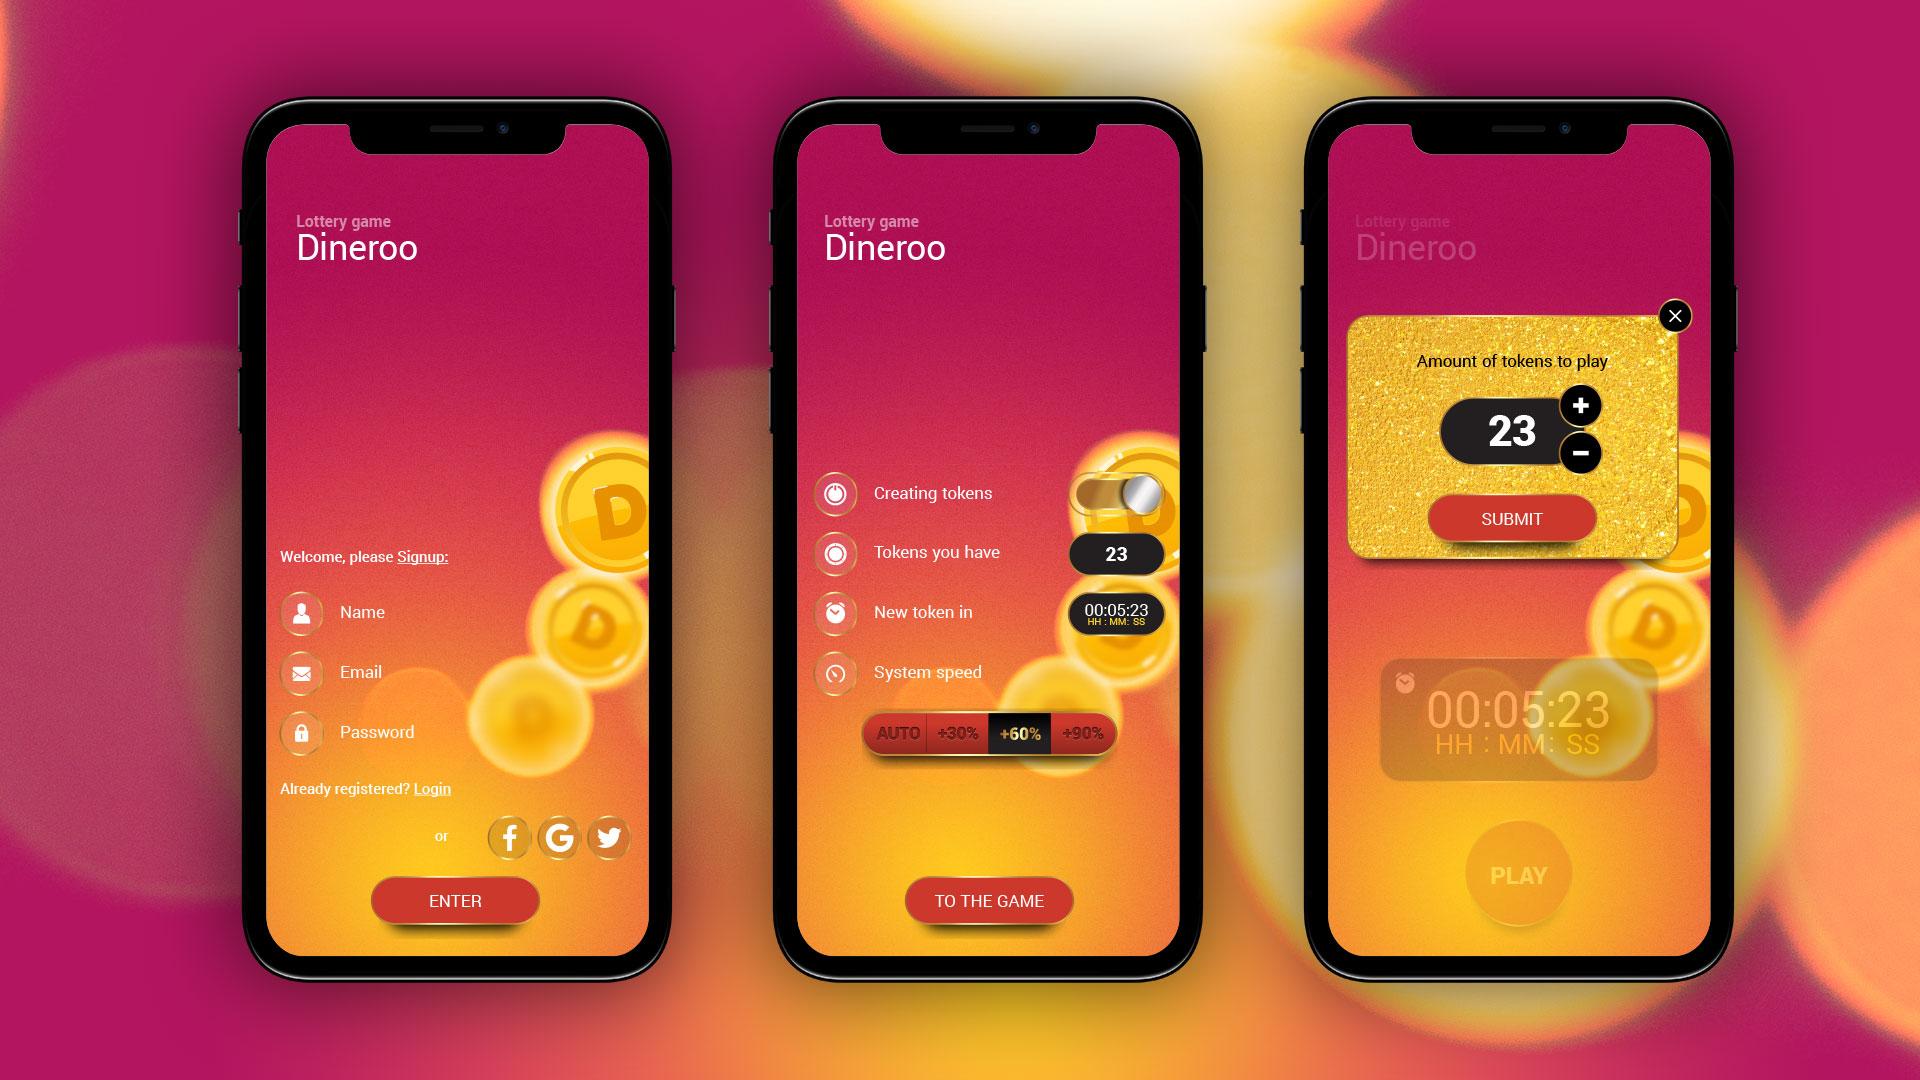 Lottery mobile app design UI עיצוב ממשק משתמש לאפליקציית מובייל Dineroo